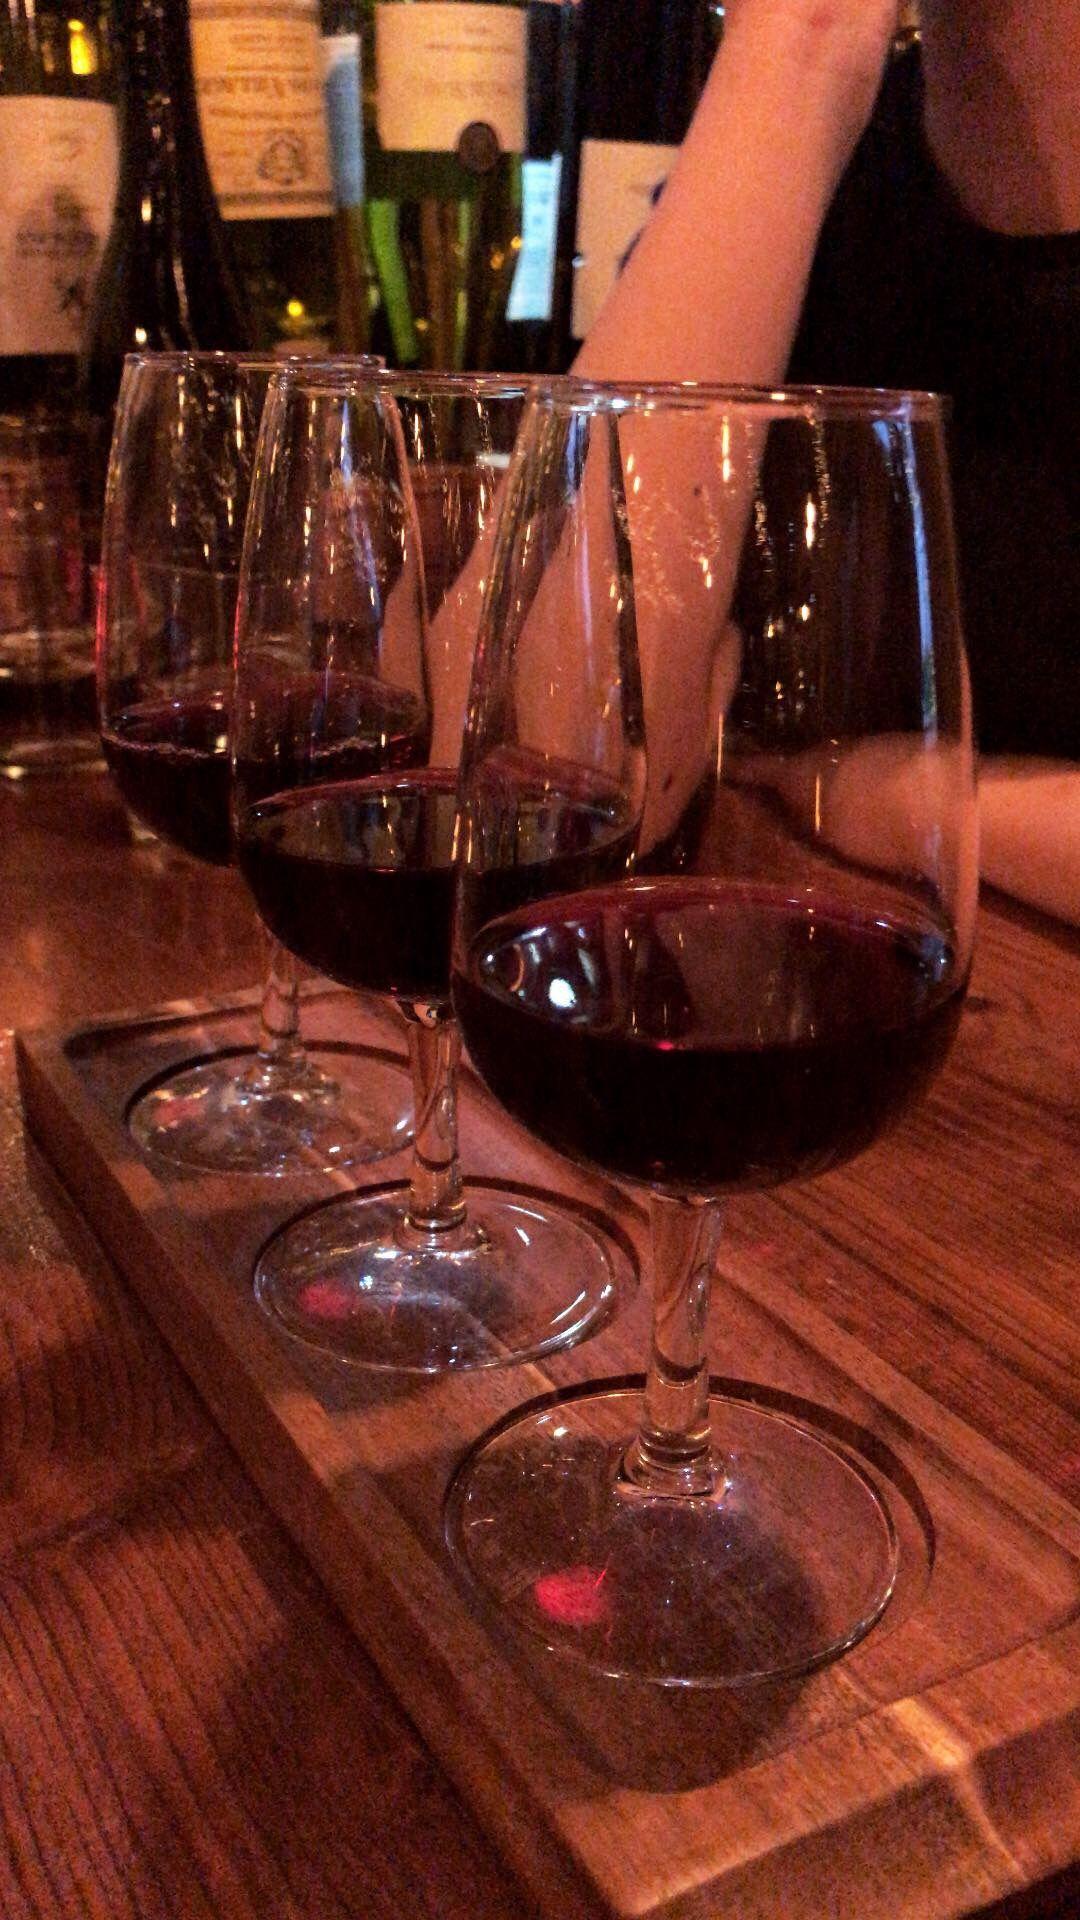 Silver Flight Partying Hard Alcohol Wine Bottle